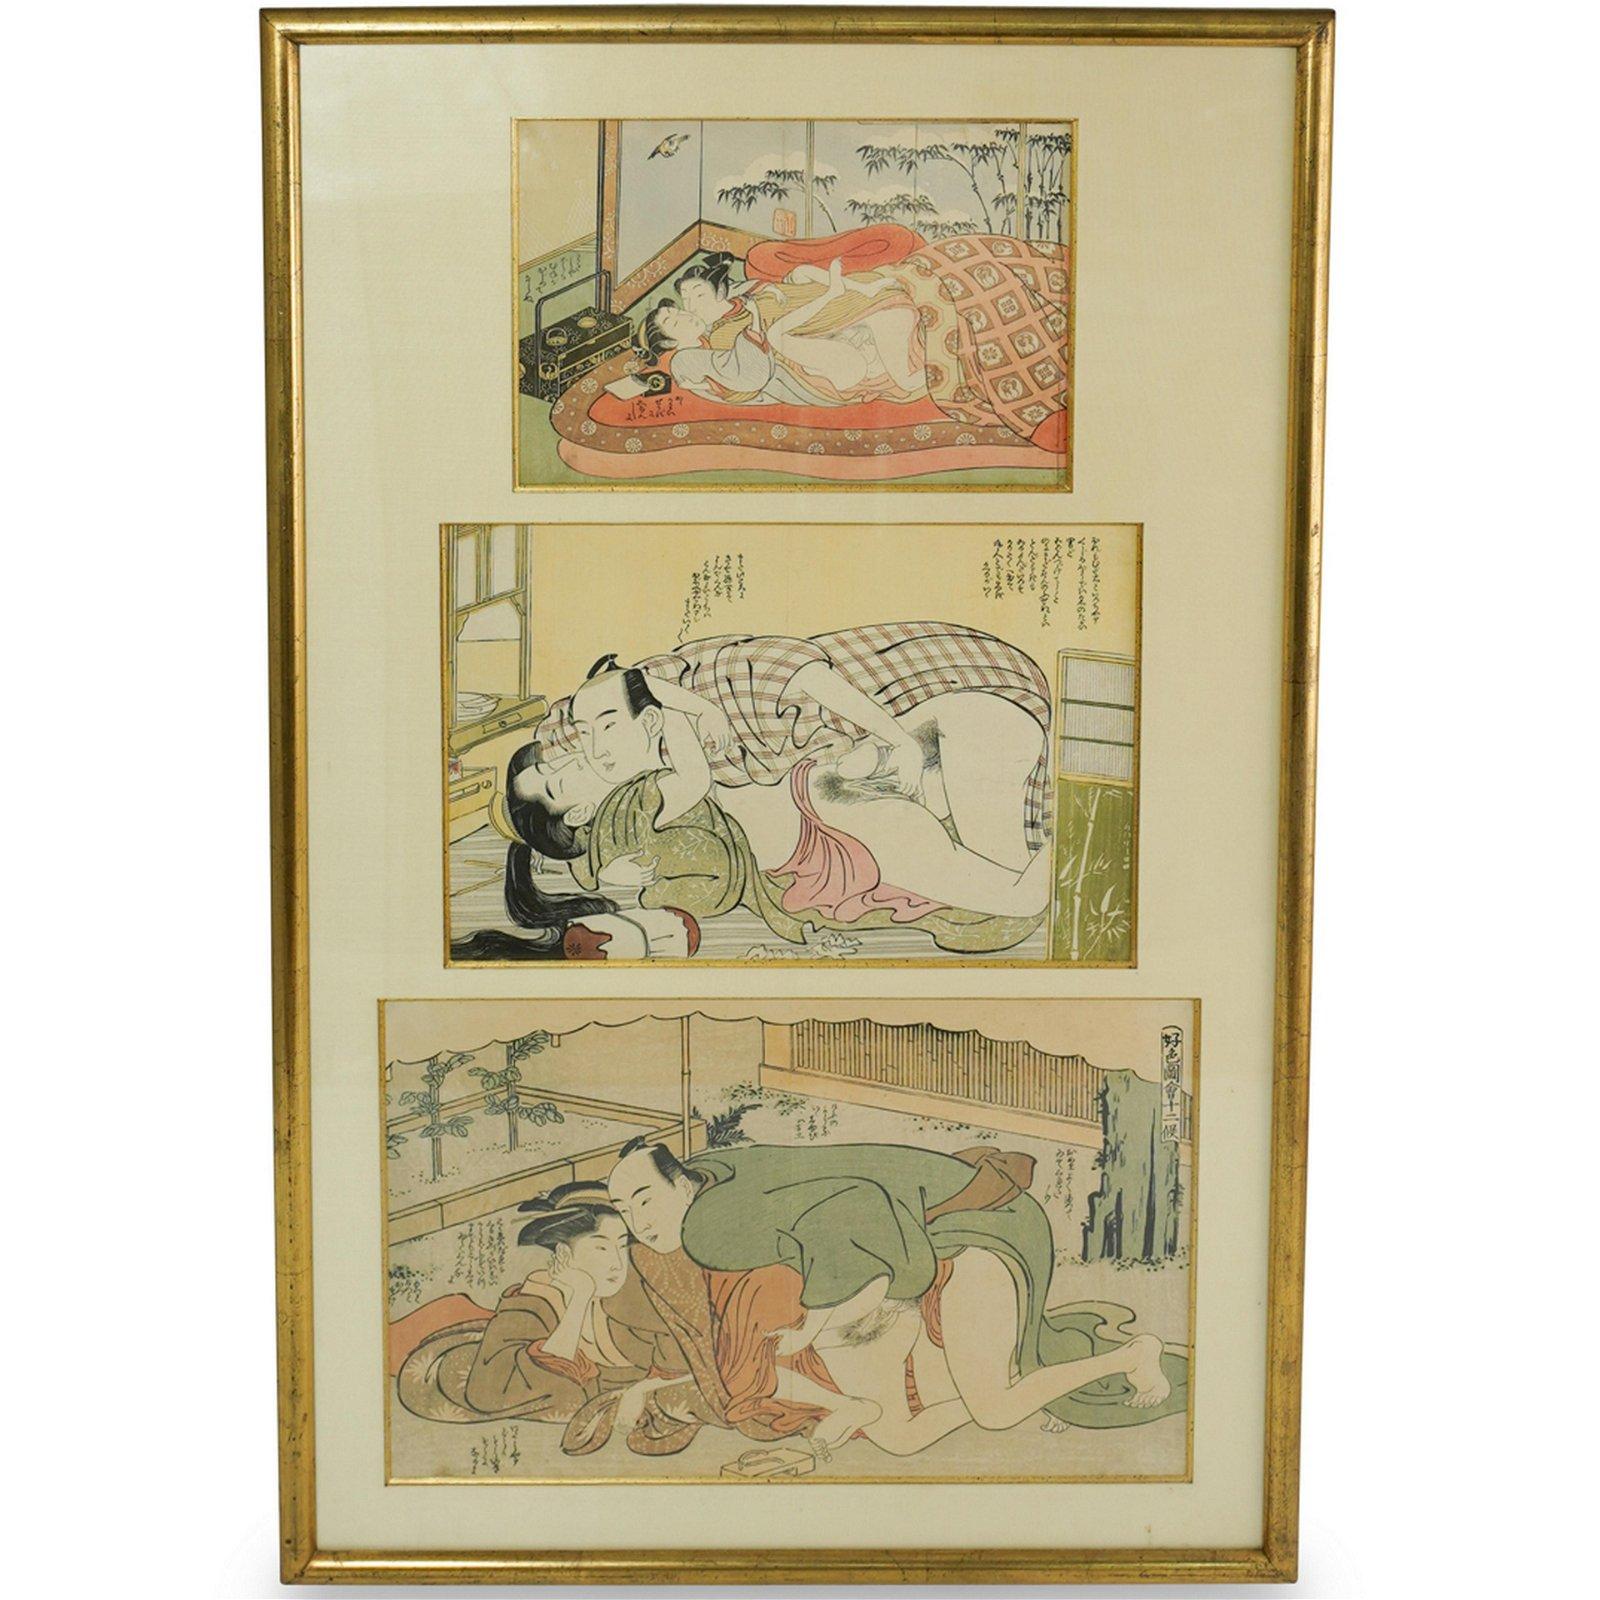 Japanese Ukiyo-E Erotic Woodblock Print